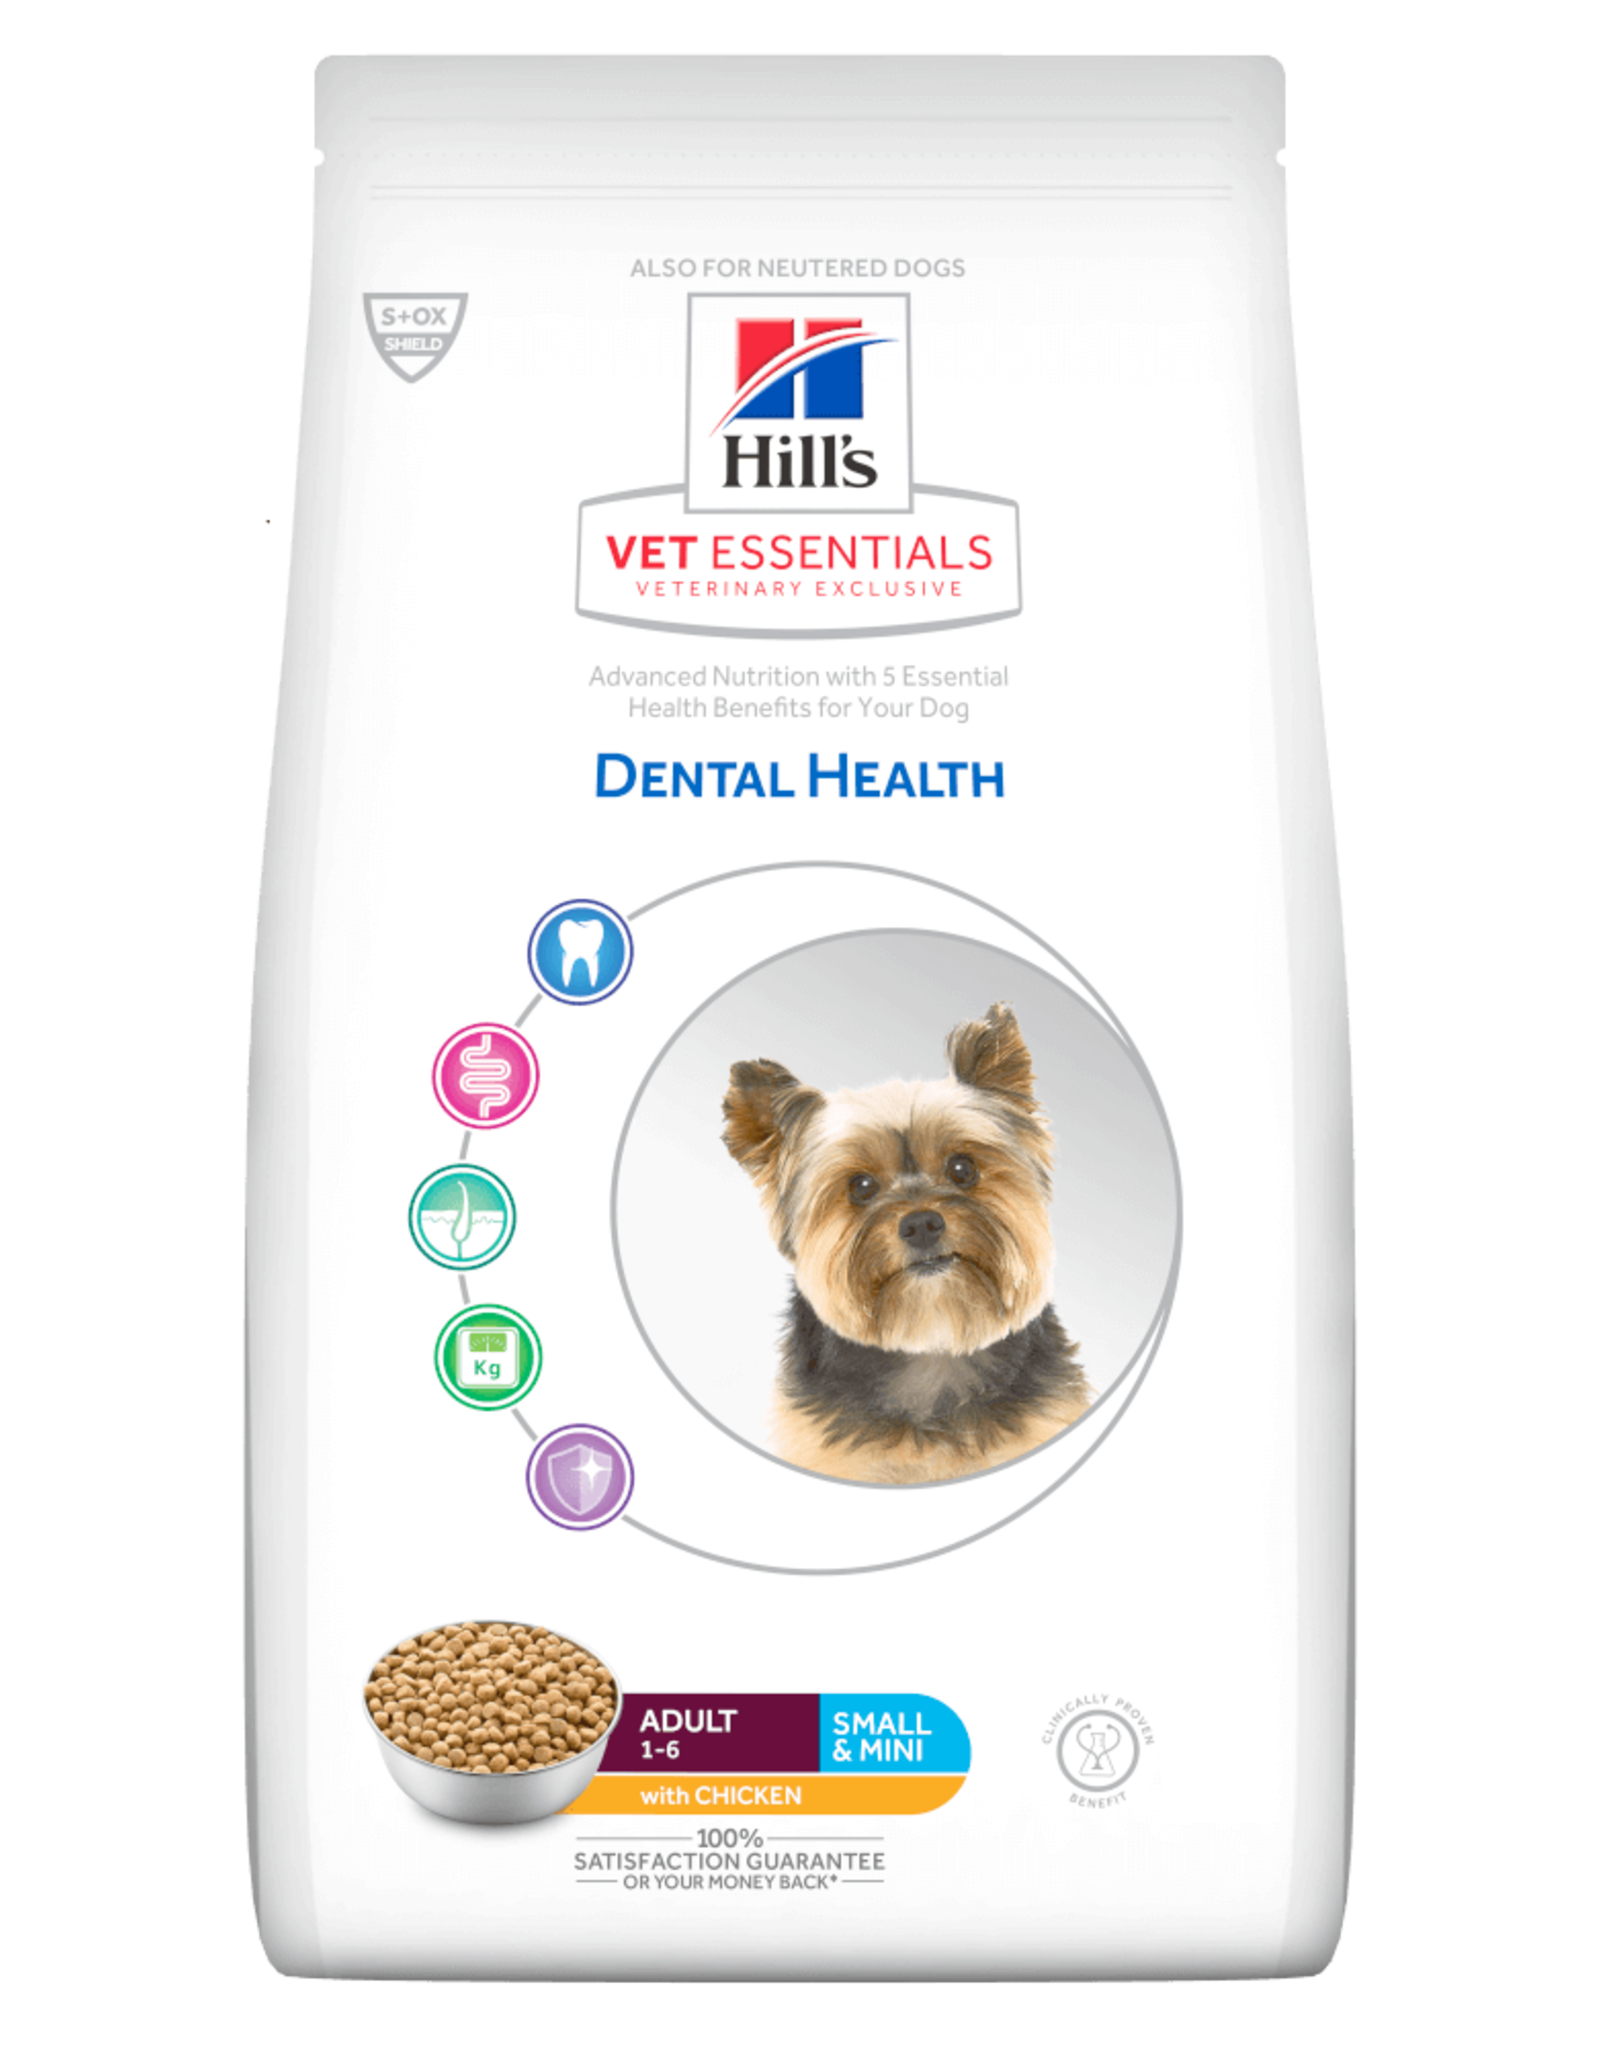 Hill's Hills Vetess Canine Adult Dental Mini Chk 7kg